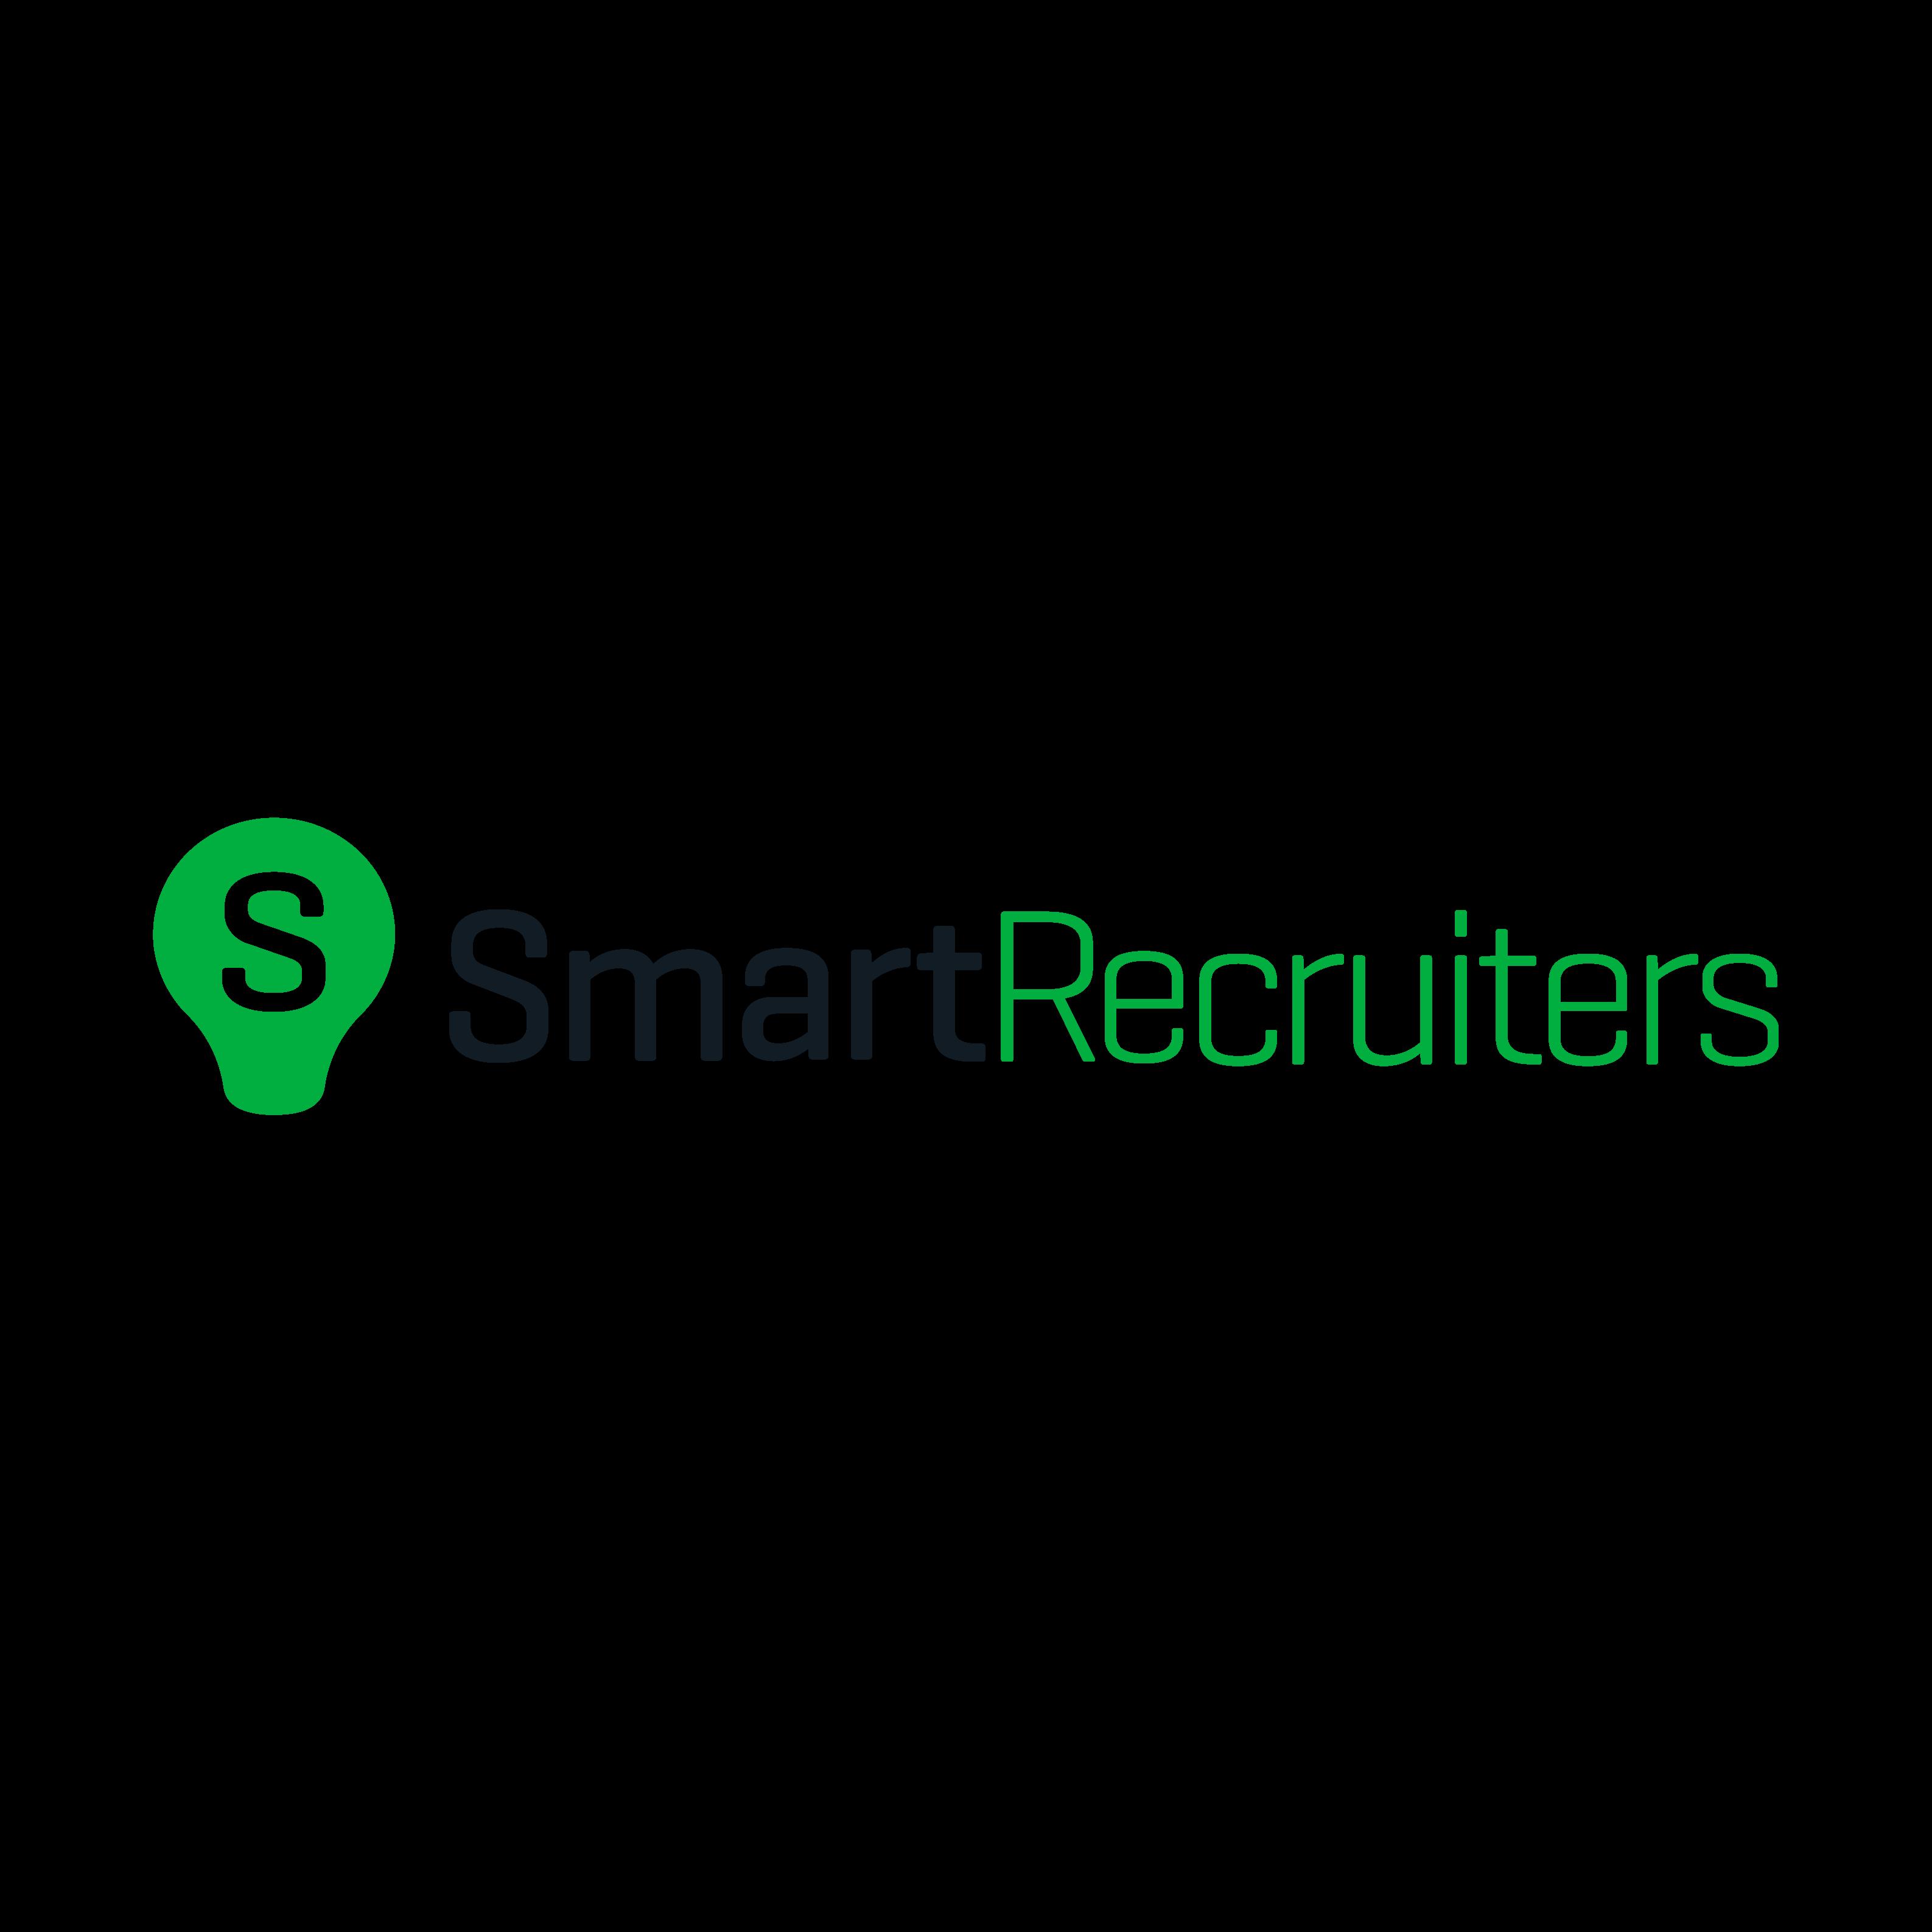 Jenae Kaska – SmartRecruiters